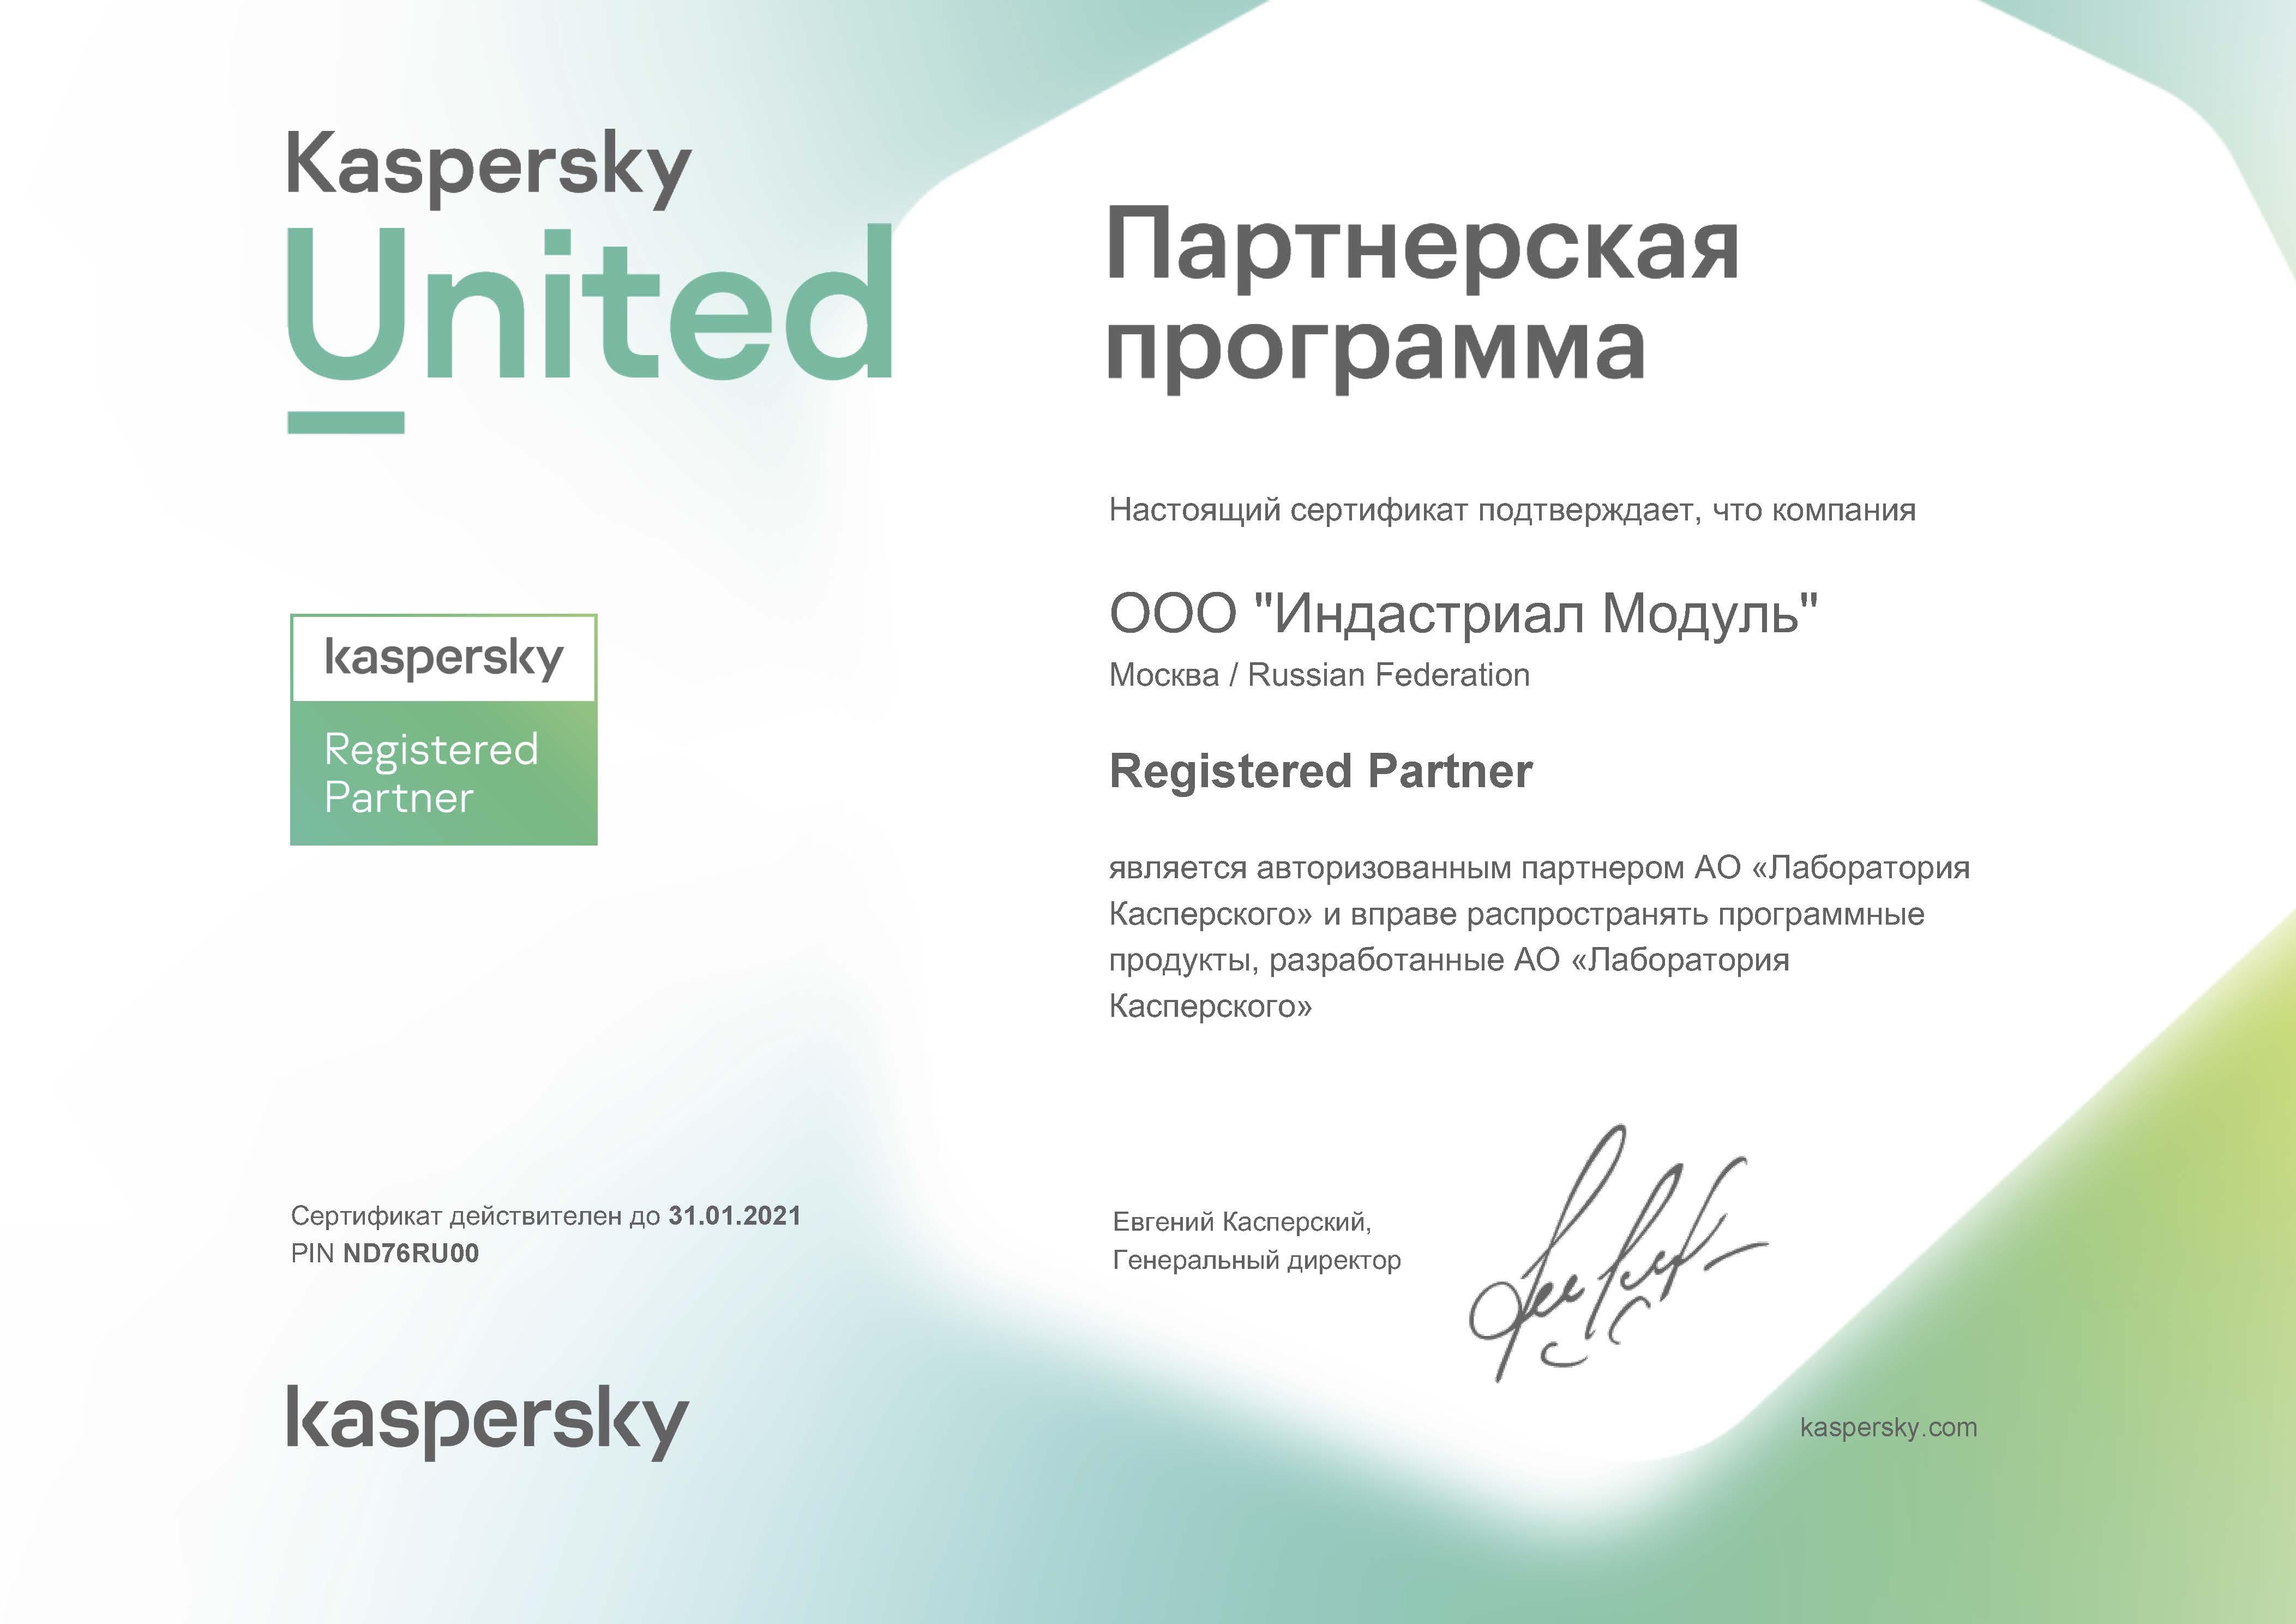 сертификат Kaspersky B2C сферы